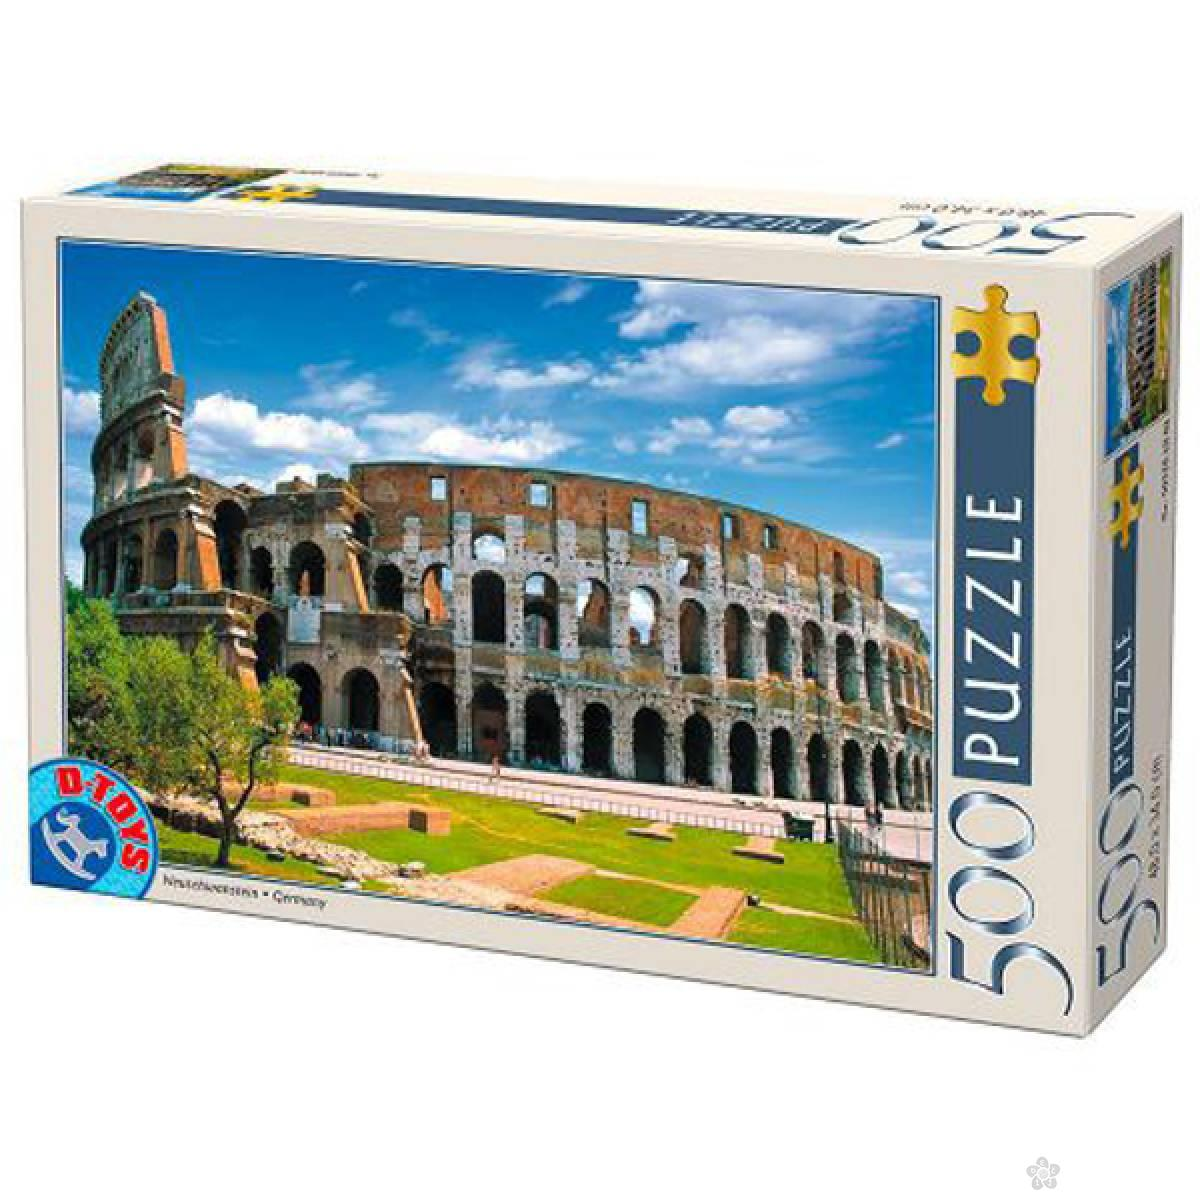 Puzzla Colosseum Rome 500pcs 07/50328-07